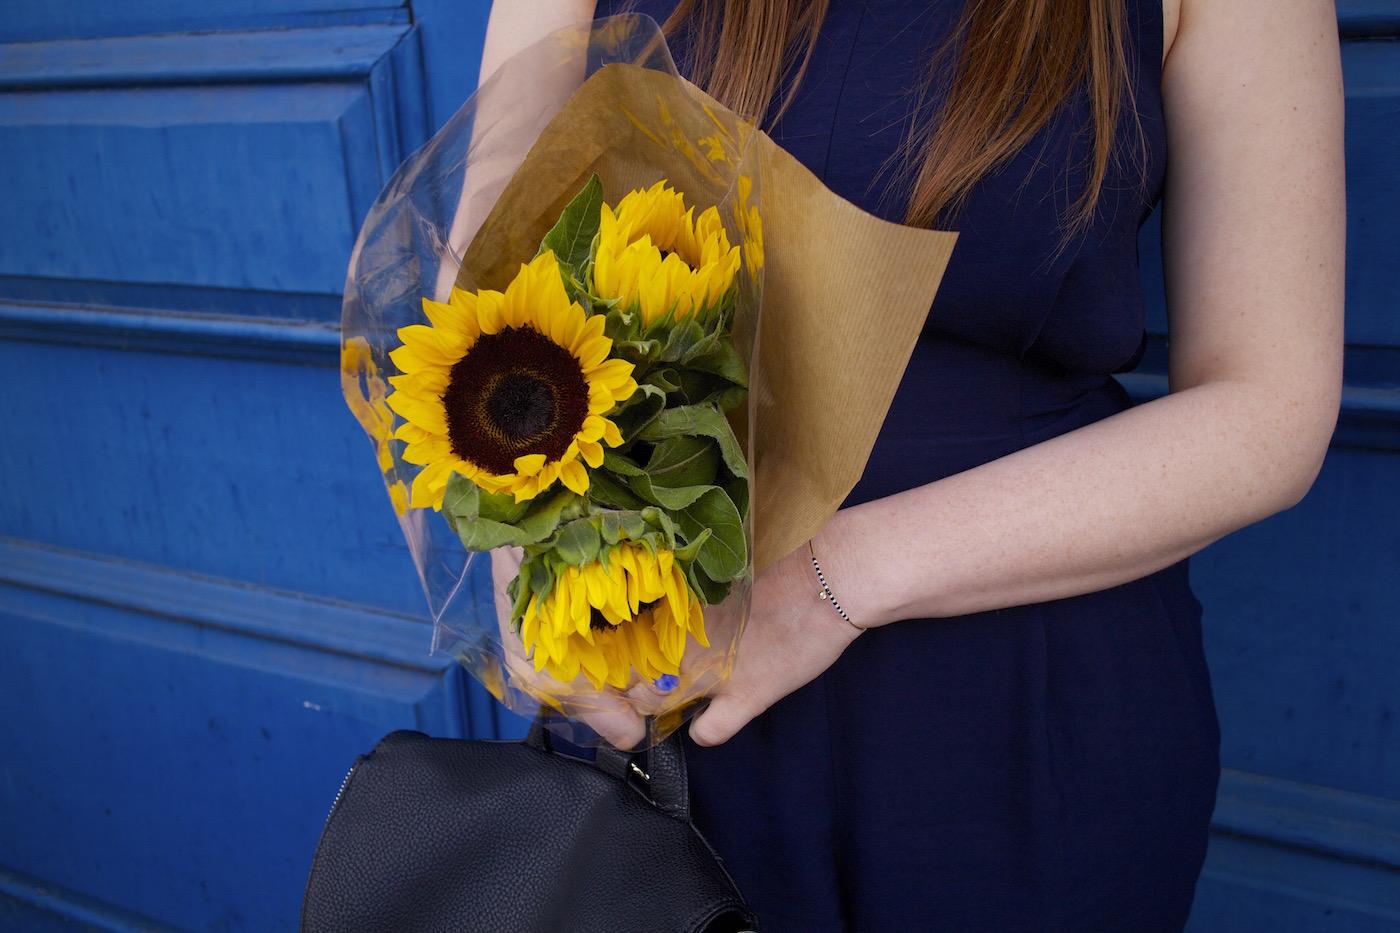 london blogger style pretty posh oh my gosh sunflowers